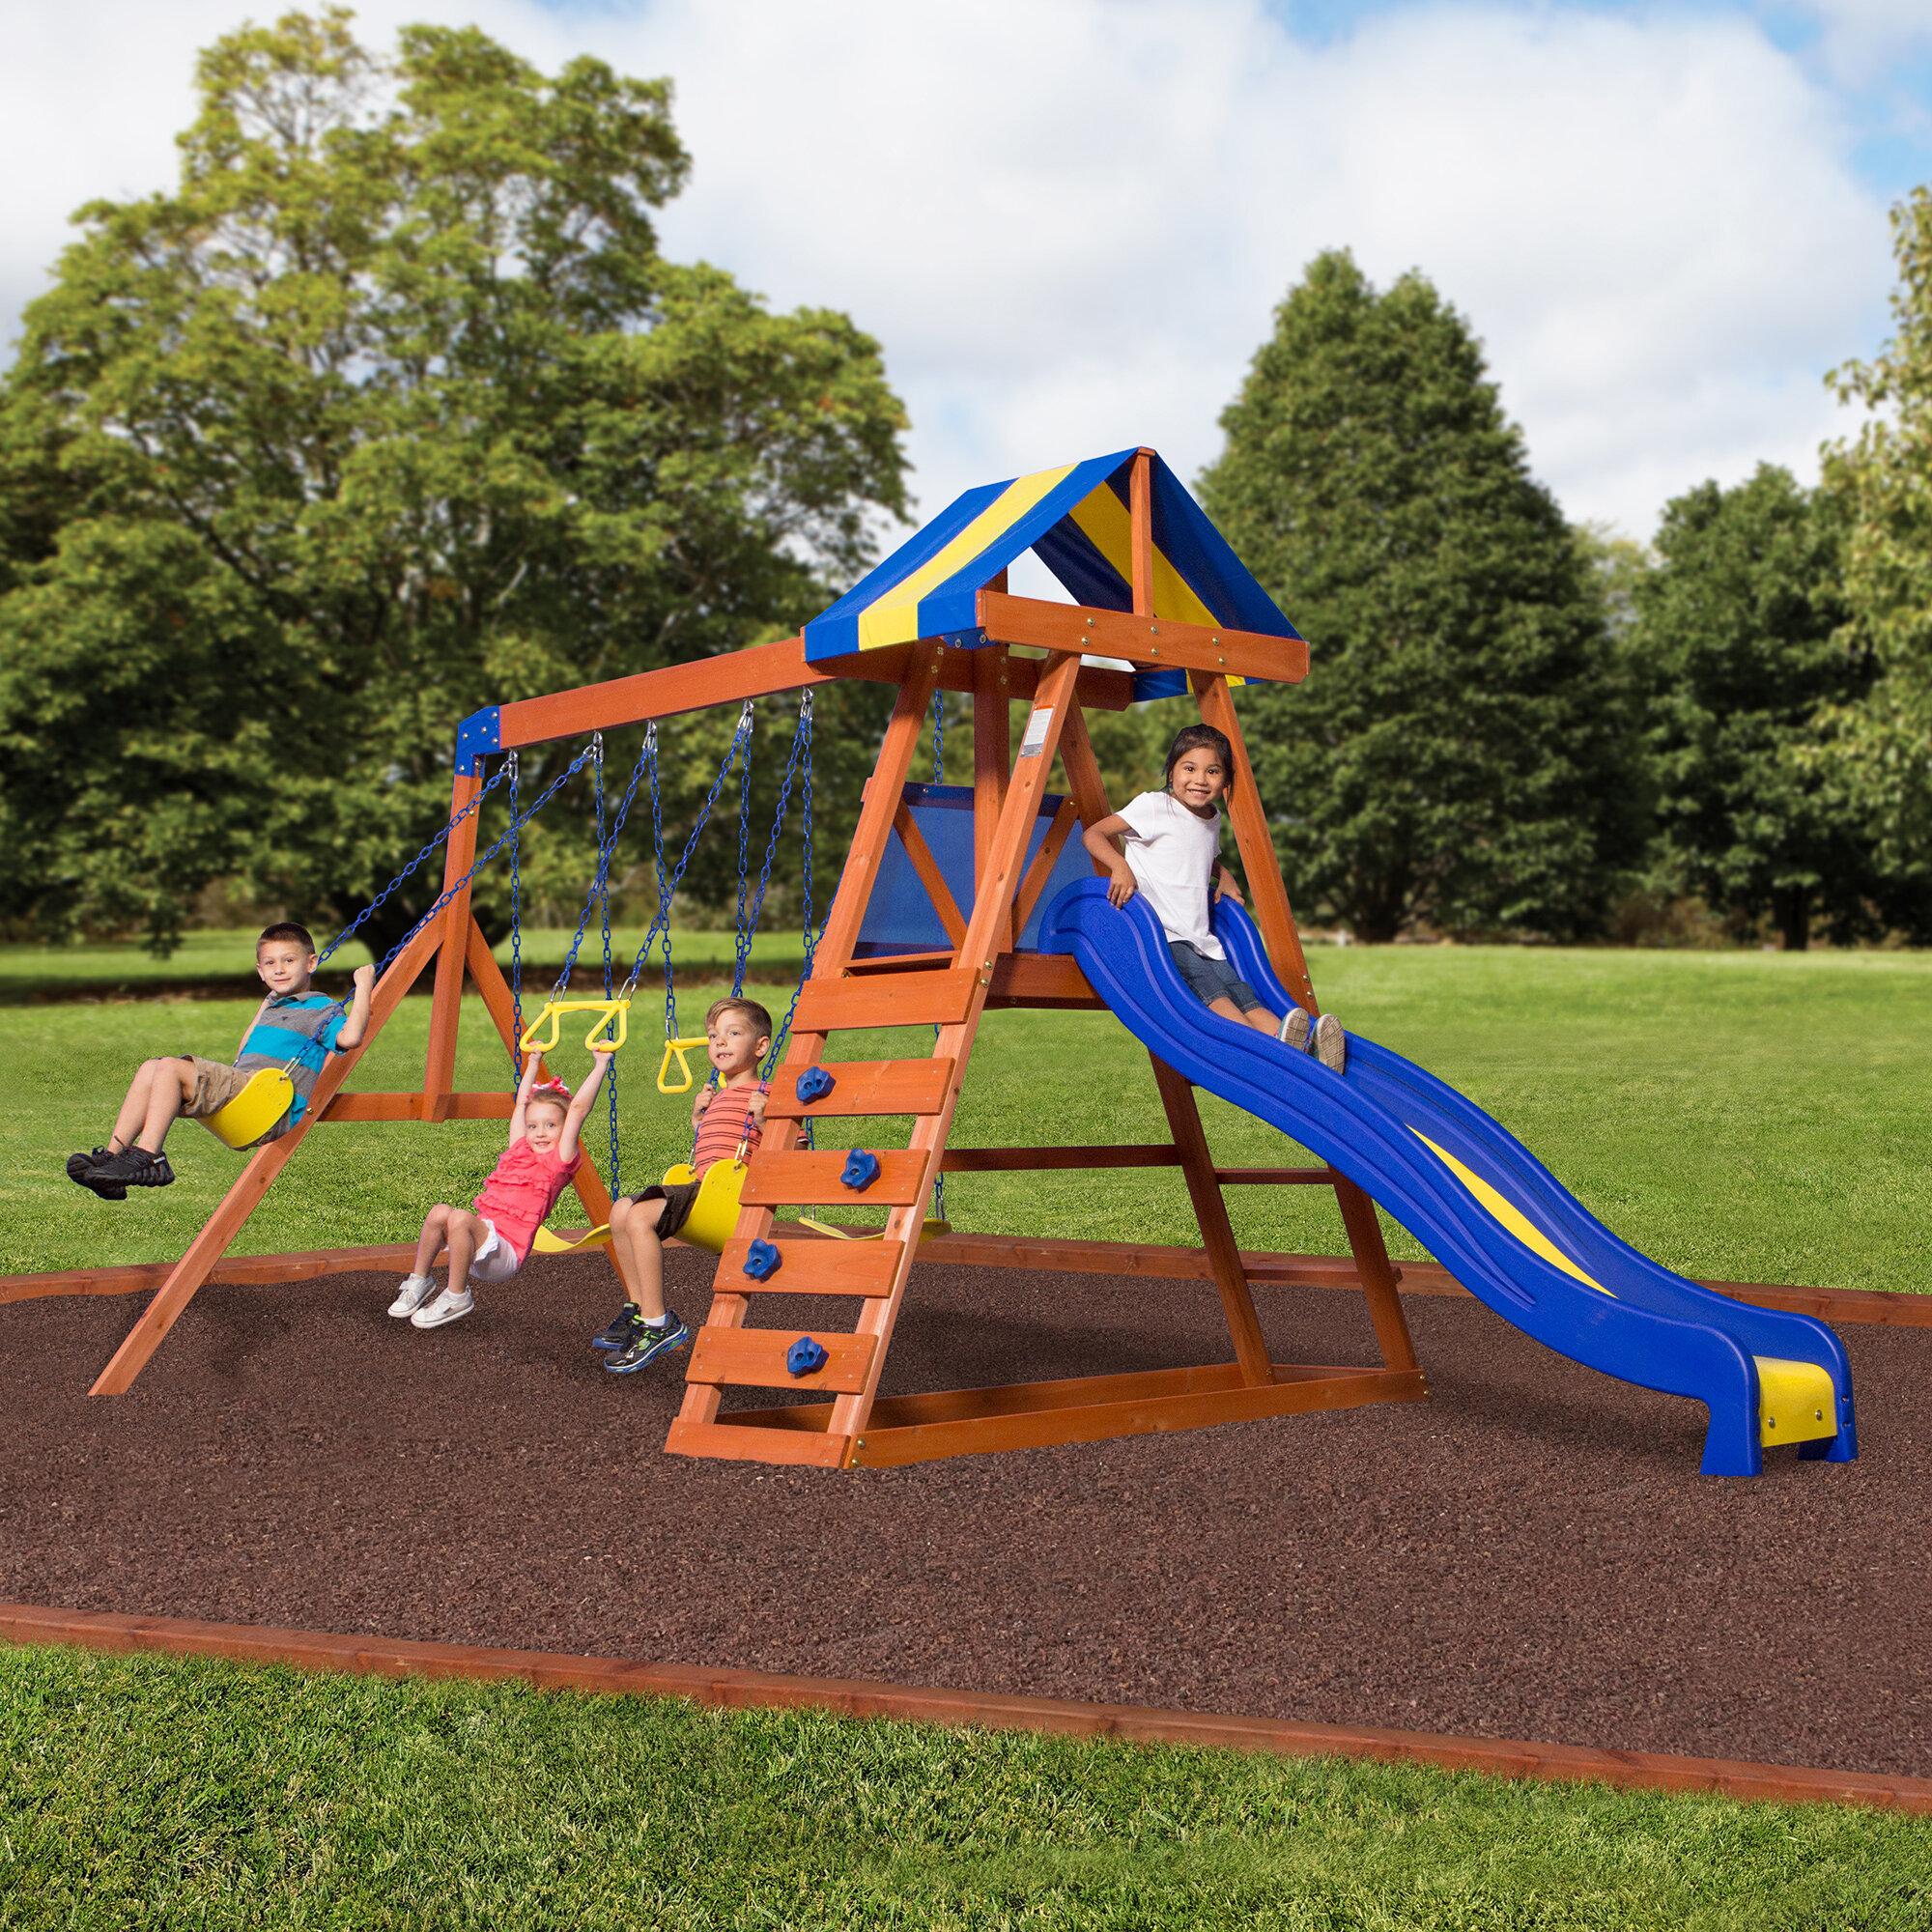 Backyard Discovery Dayton All Cedar Swing Set Reviews Wayfair